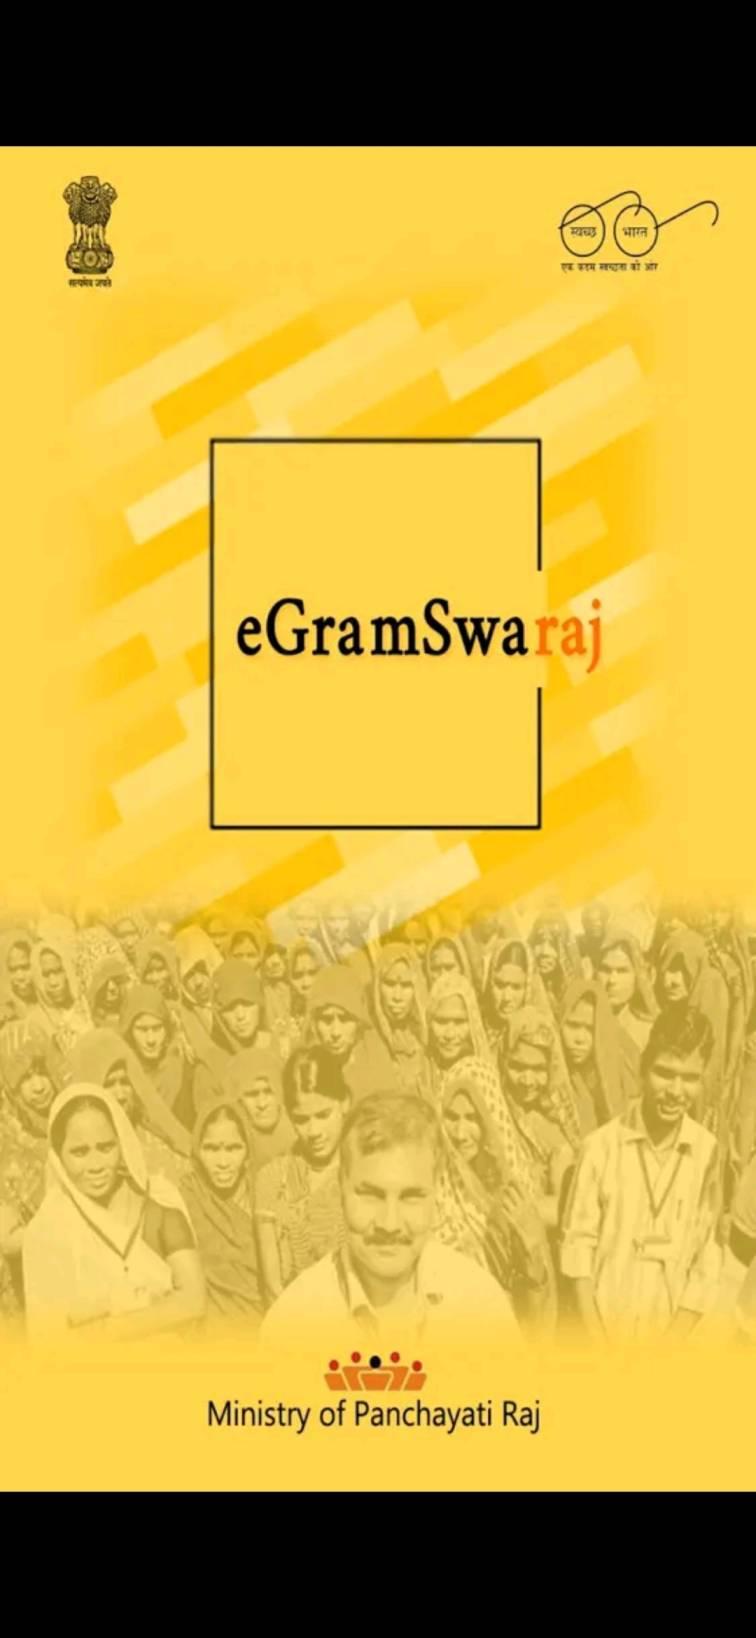 swamitva yojana app download